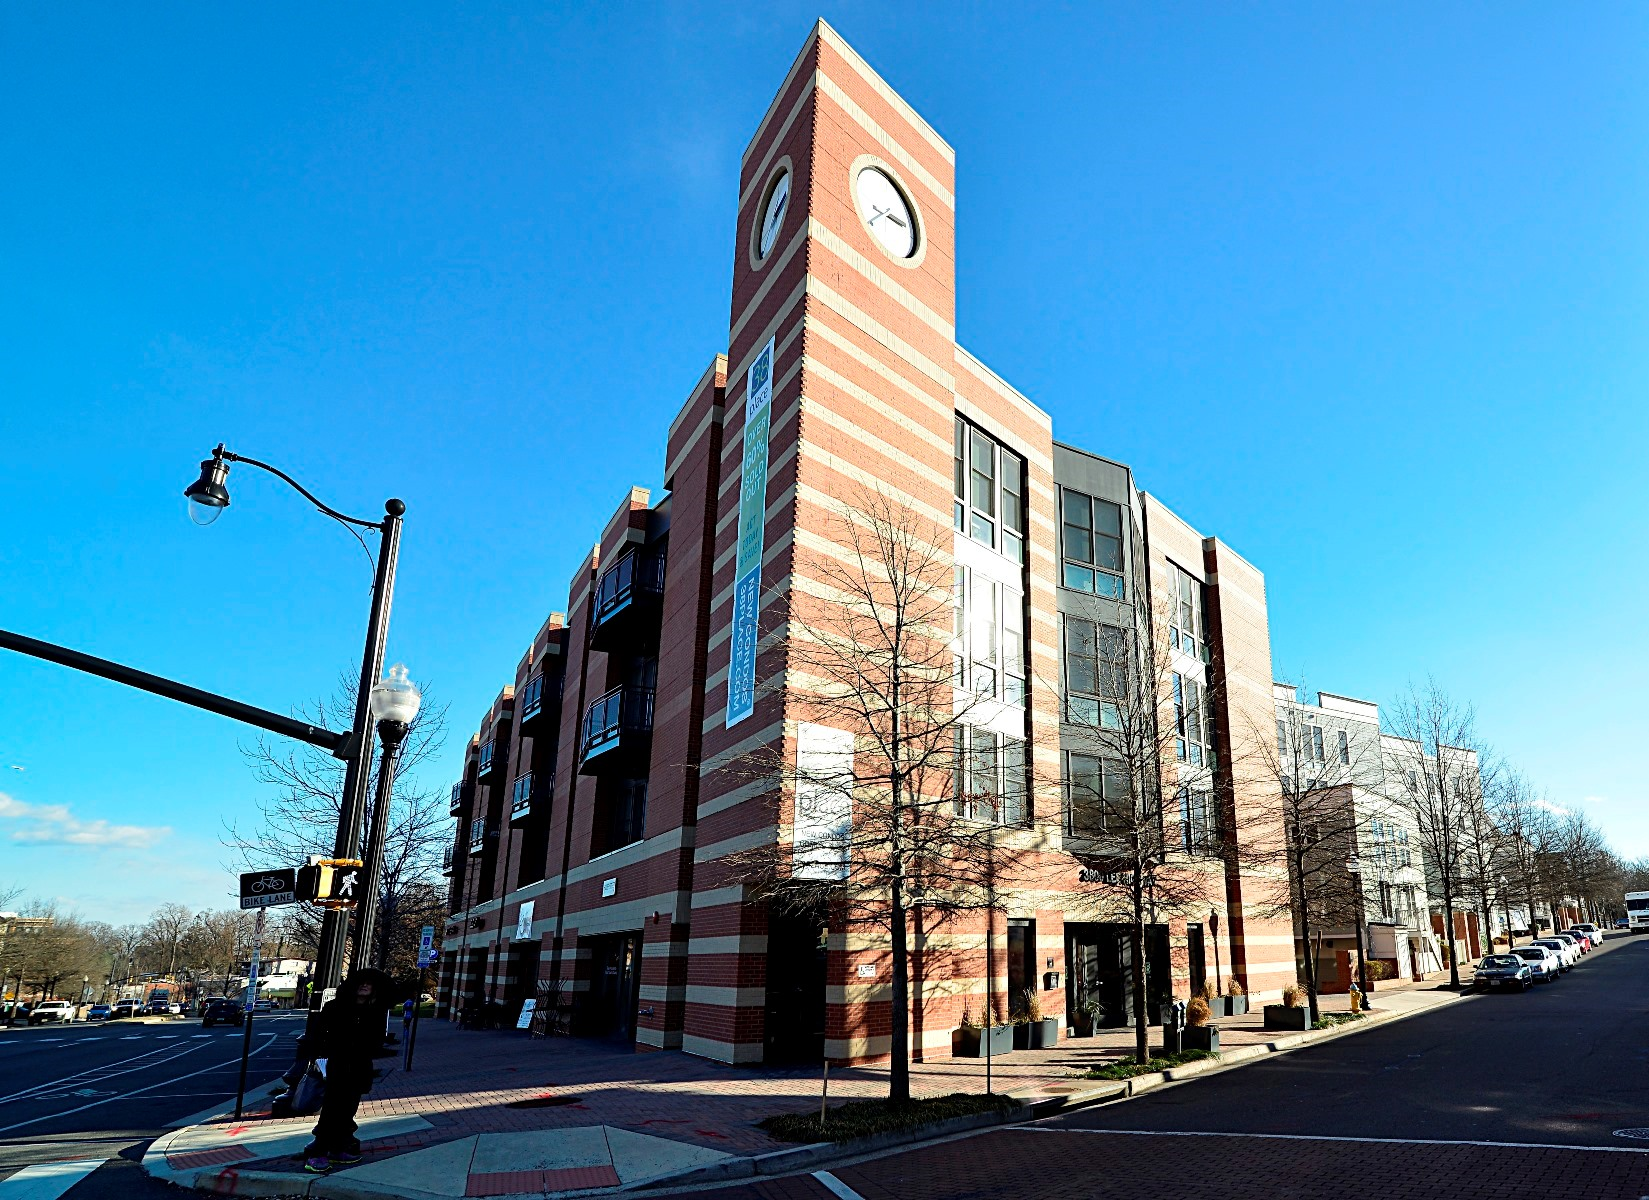 Condominium for Sale at 3800 Lee Highway 306, Arlington 3800 Lee Hwy 306 Arlington, Virginia, 22207 United States